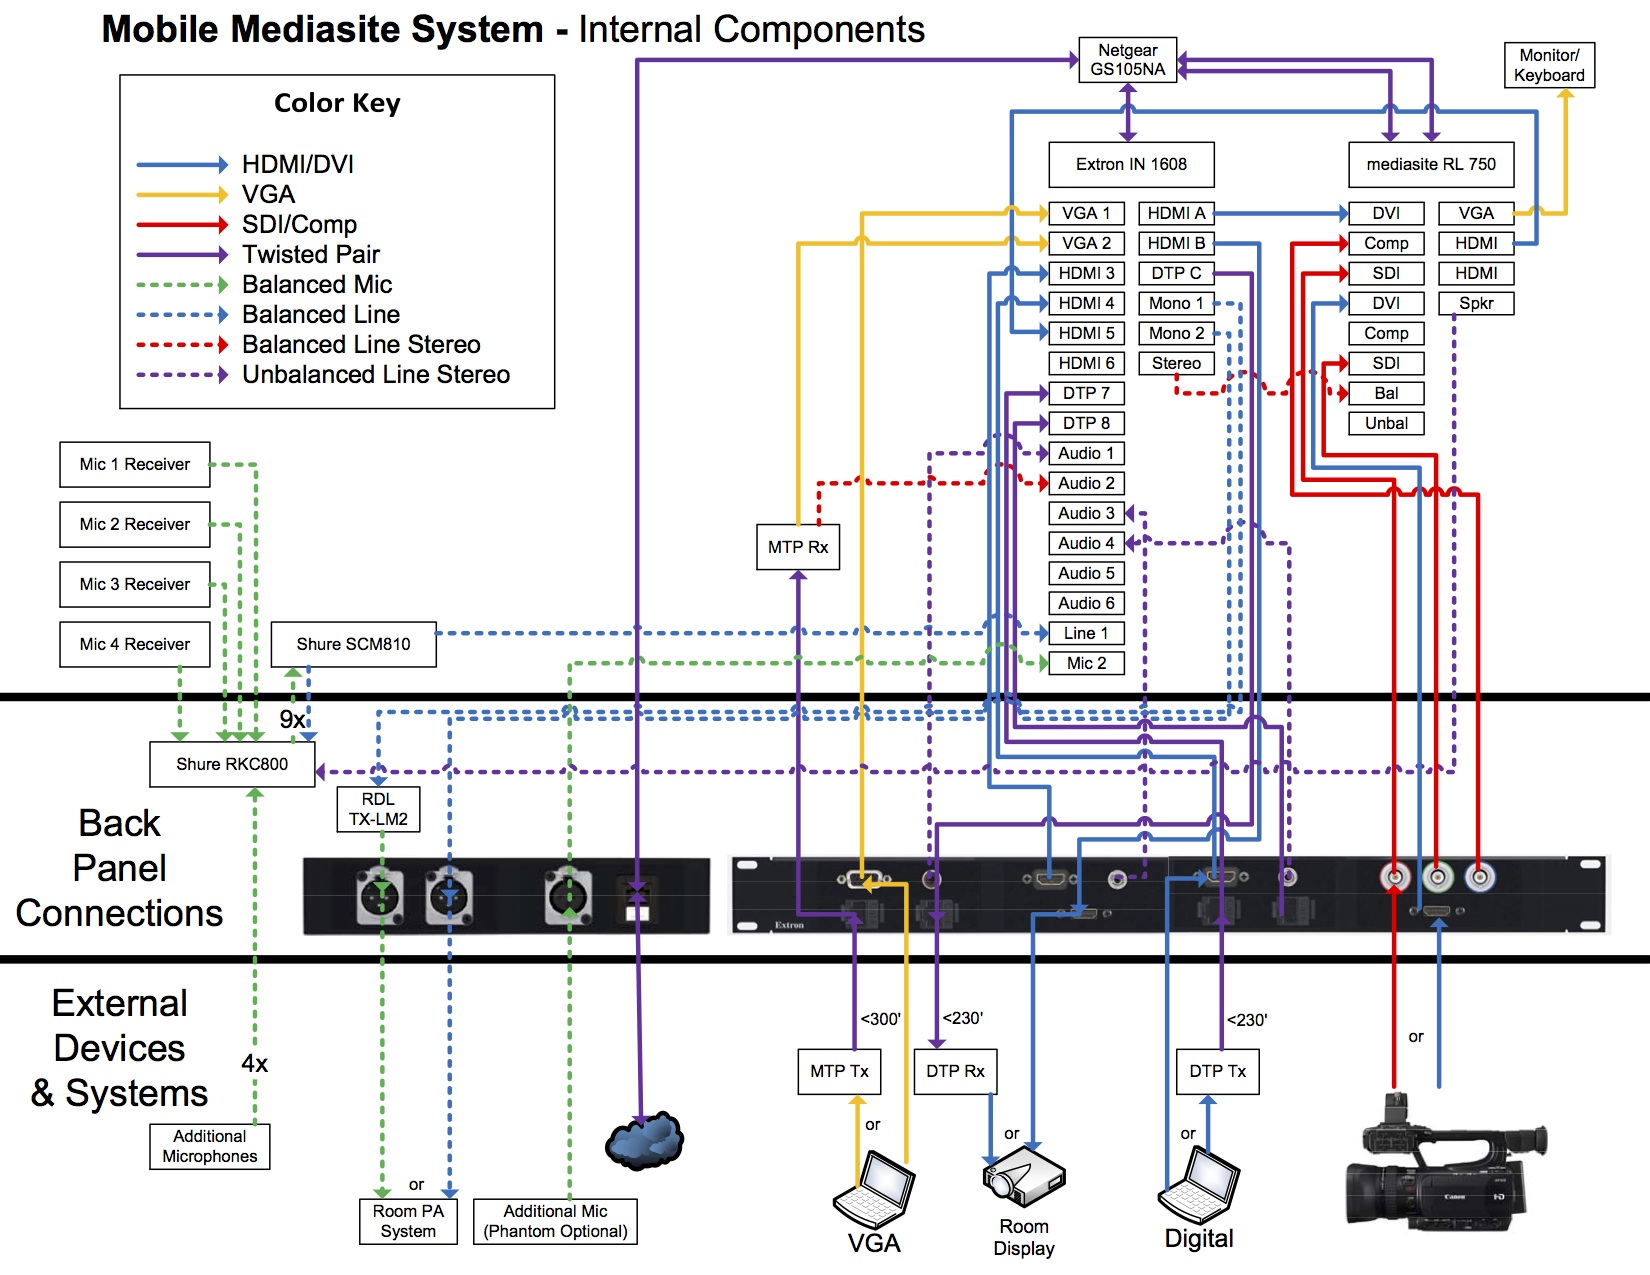 Mobile Mediasite System